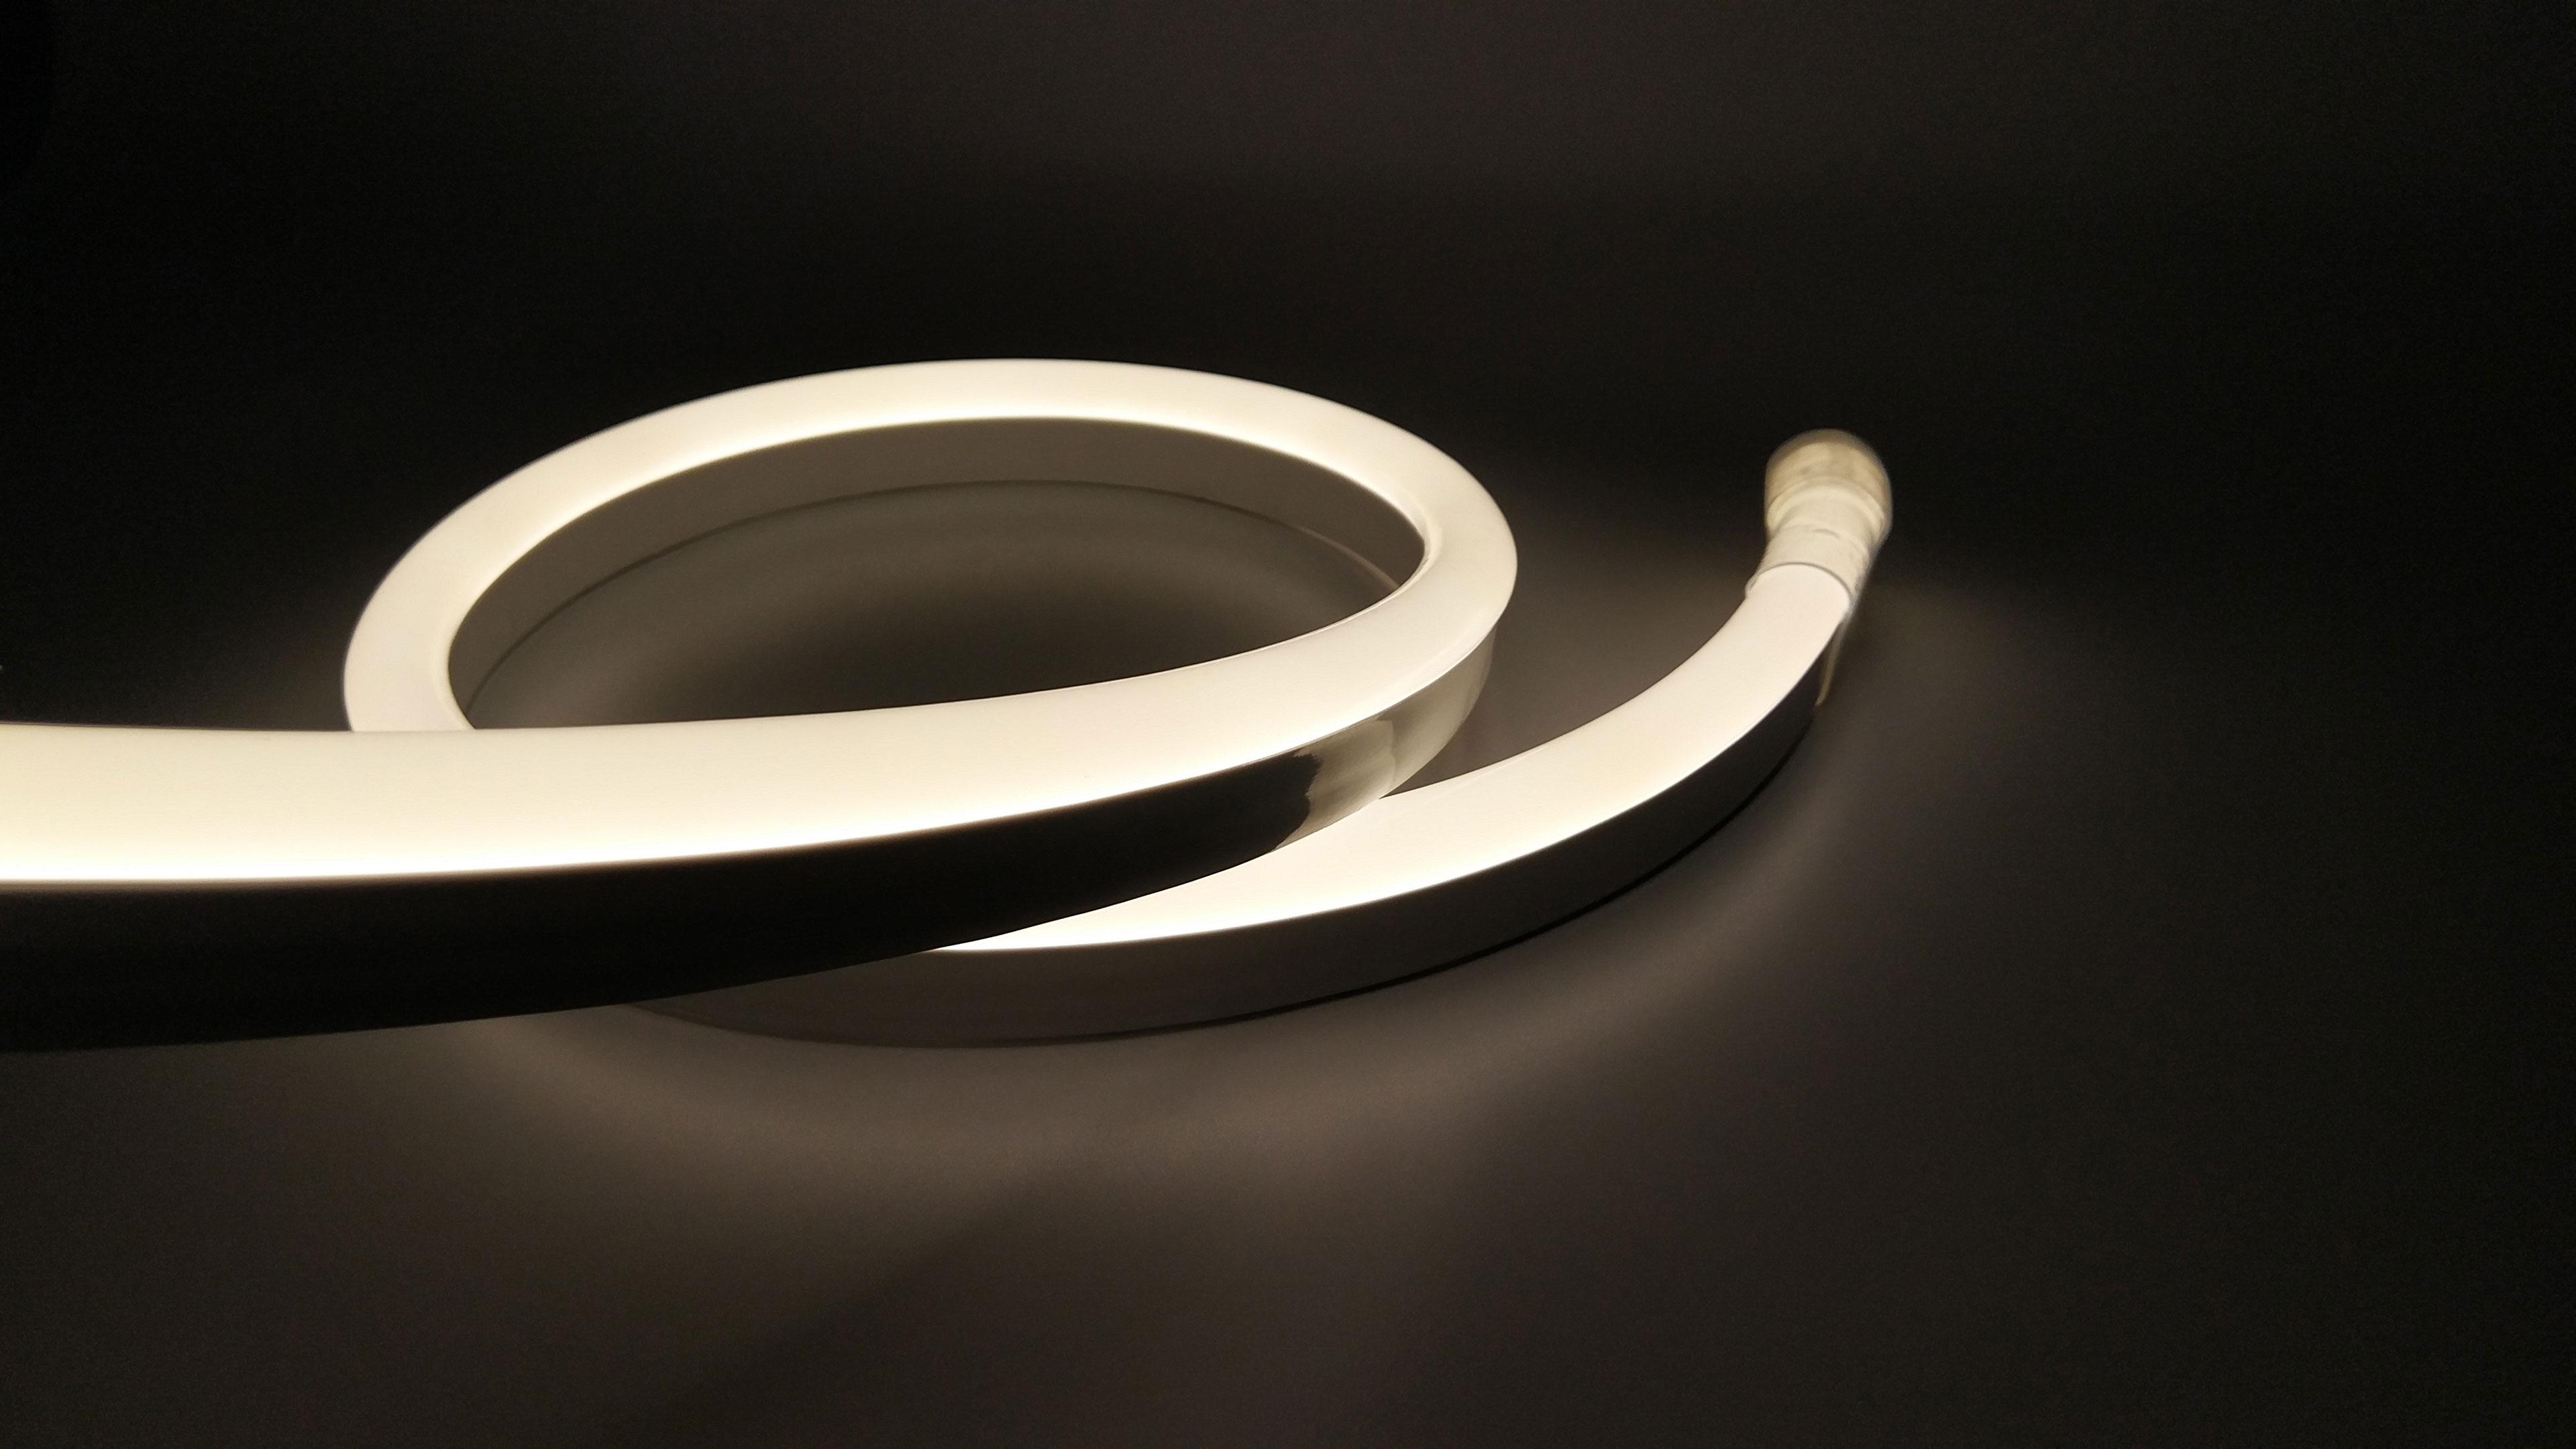 domed shape led neon flex